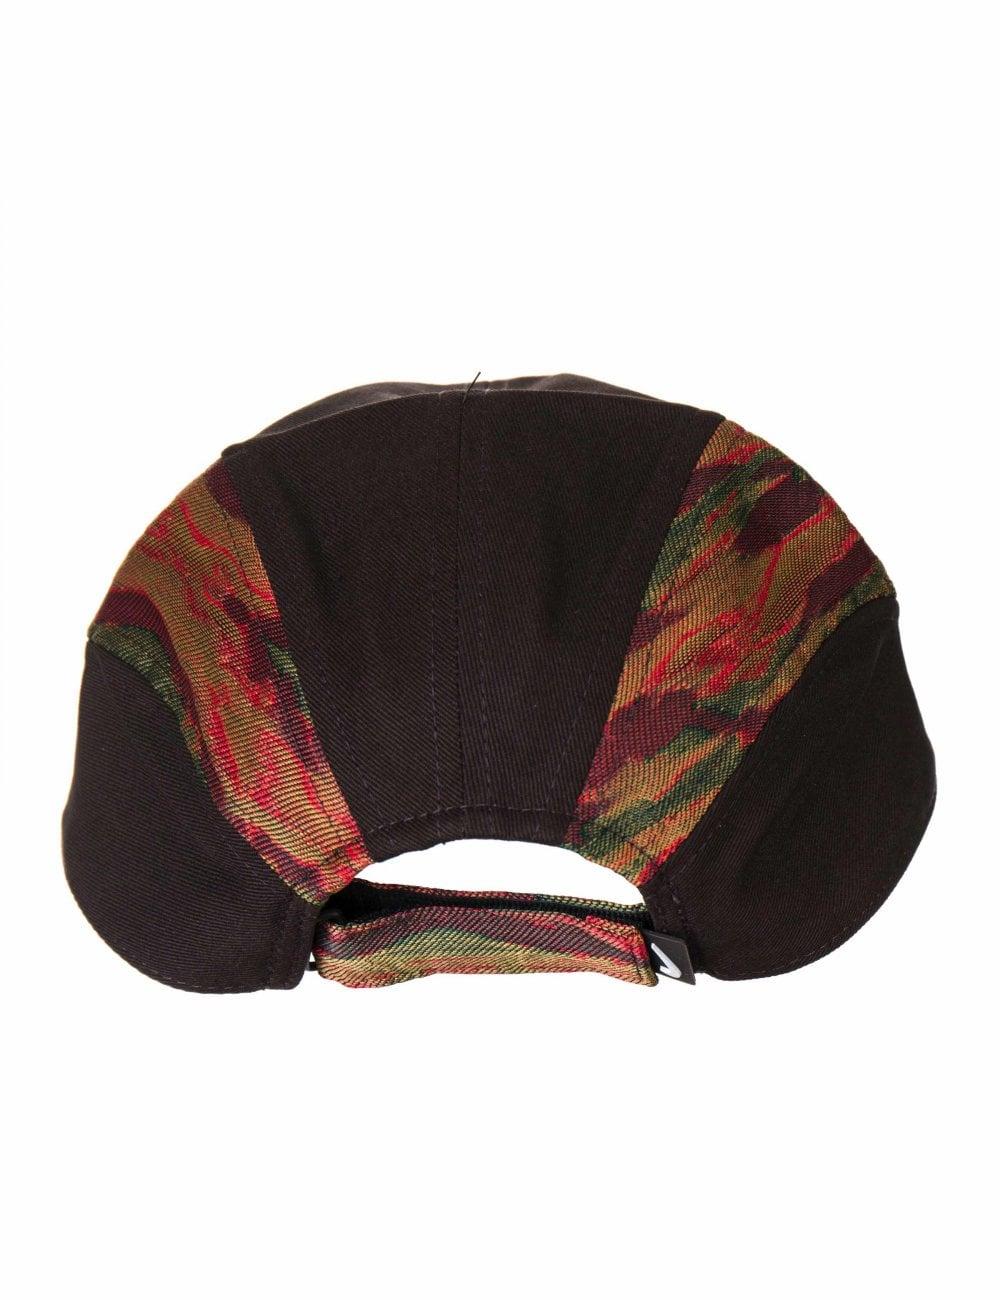 54c037108 Tailwind Cap - Velvet Brown (Guatemalan Pack)